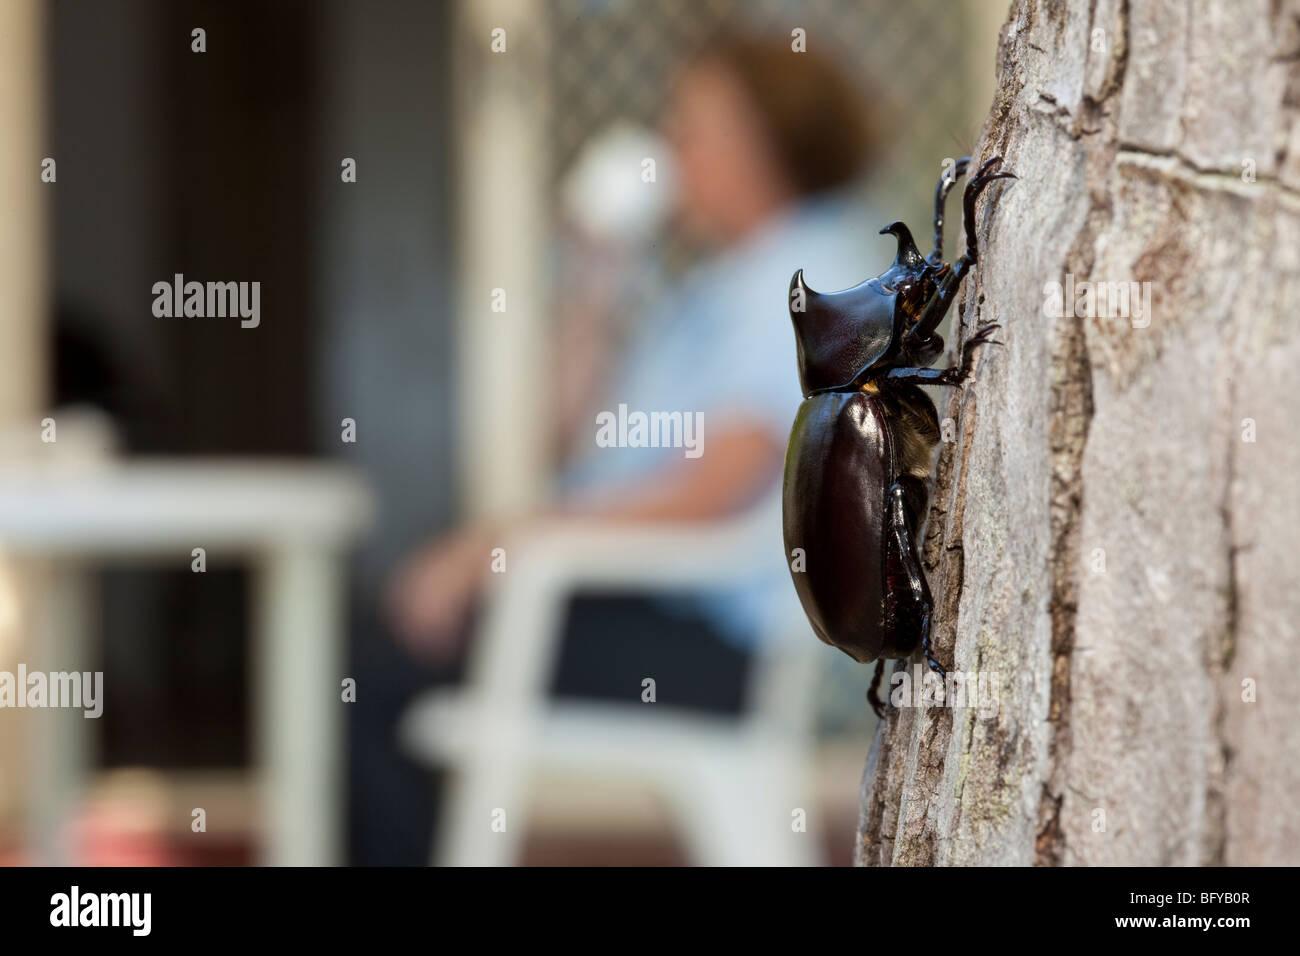 Rhinoceros Beetle, Xylotrupes gideon, Cairns, Queensland, Australia - Stock Image